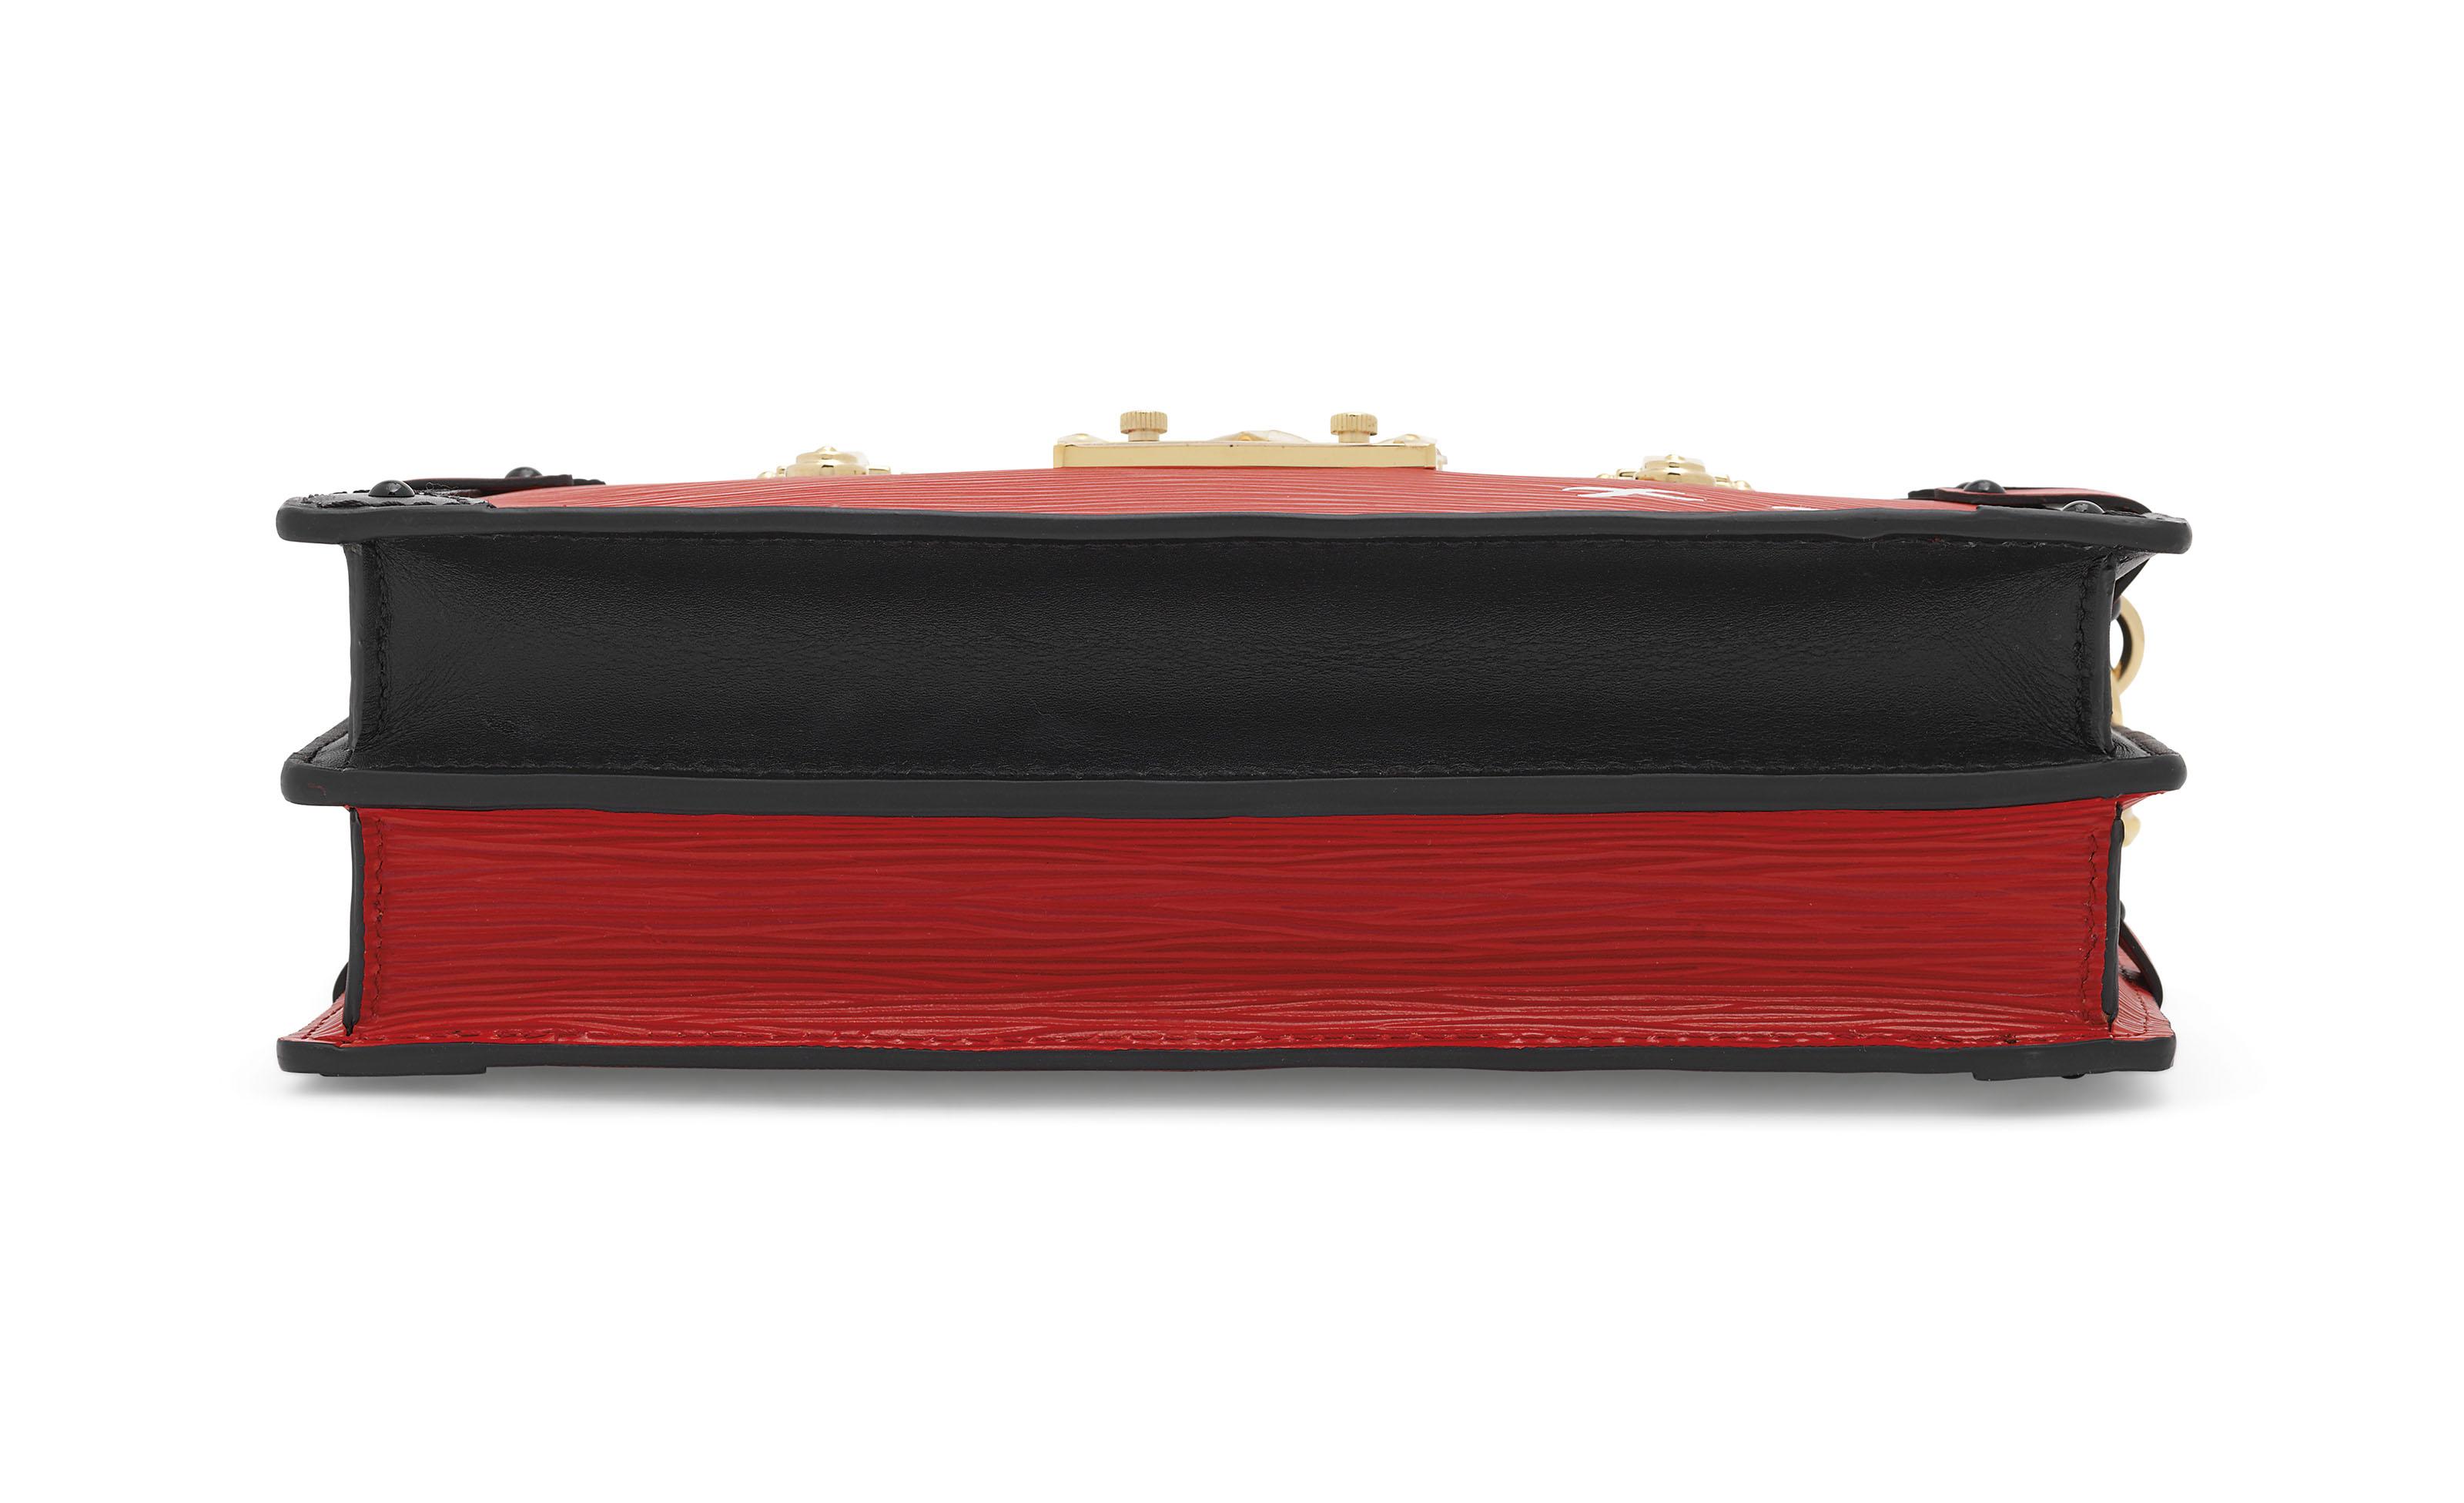 A RED ÉPI LEATHER TRUNK CLUTCH